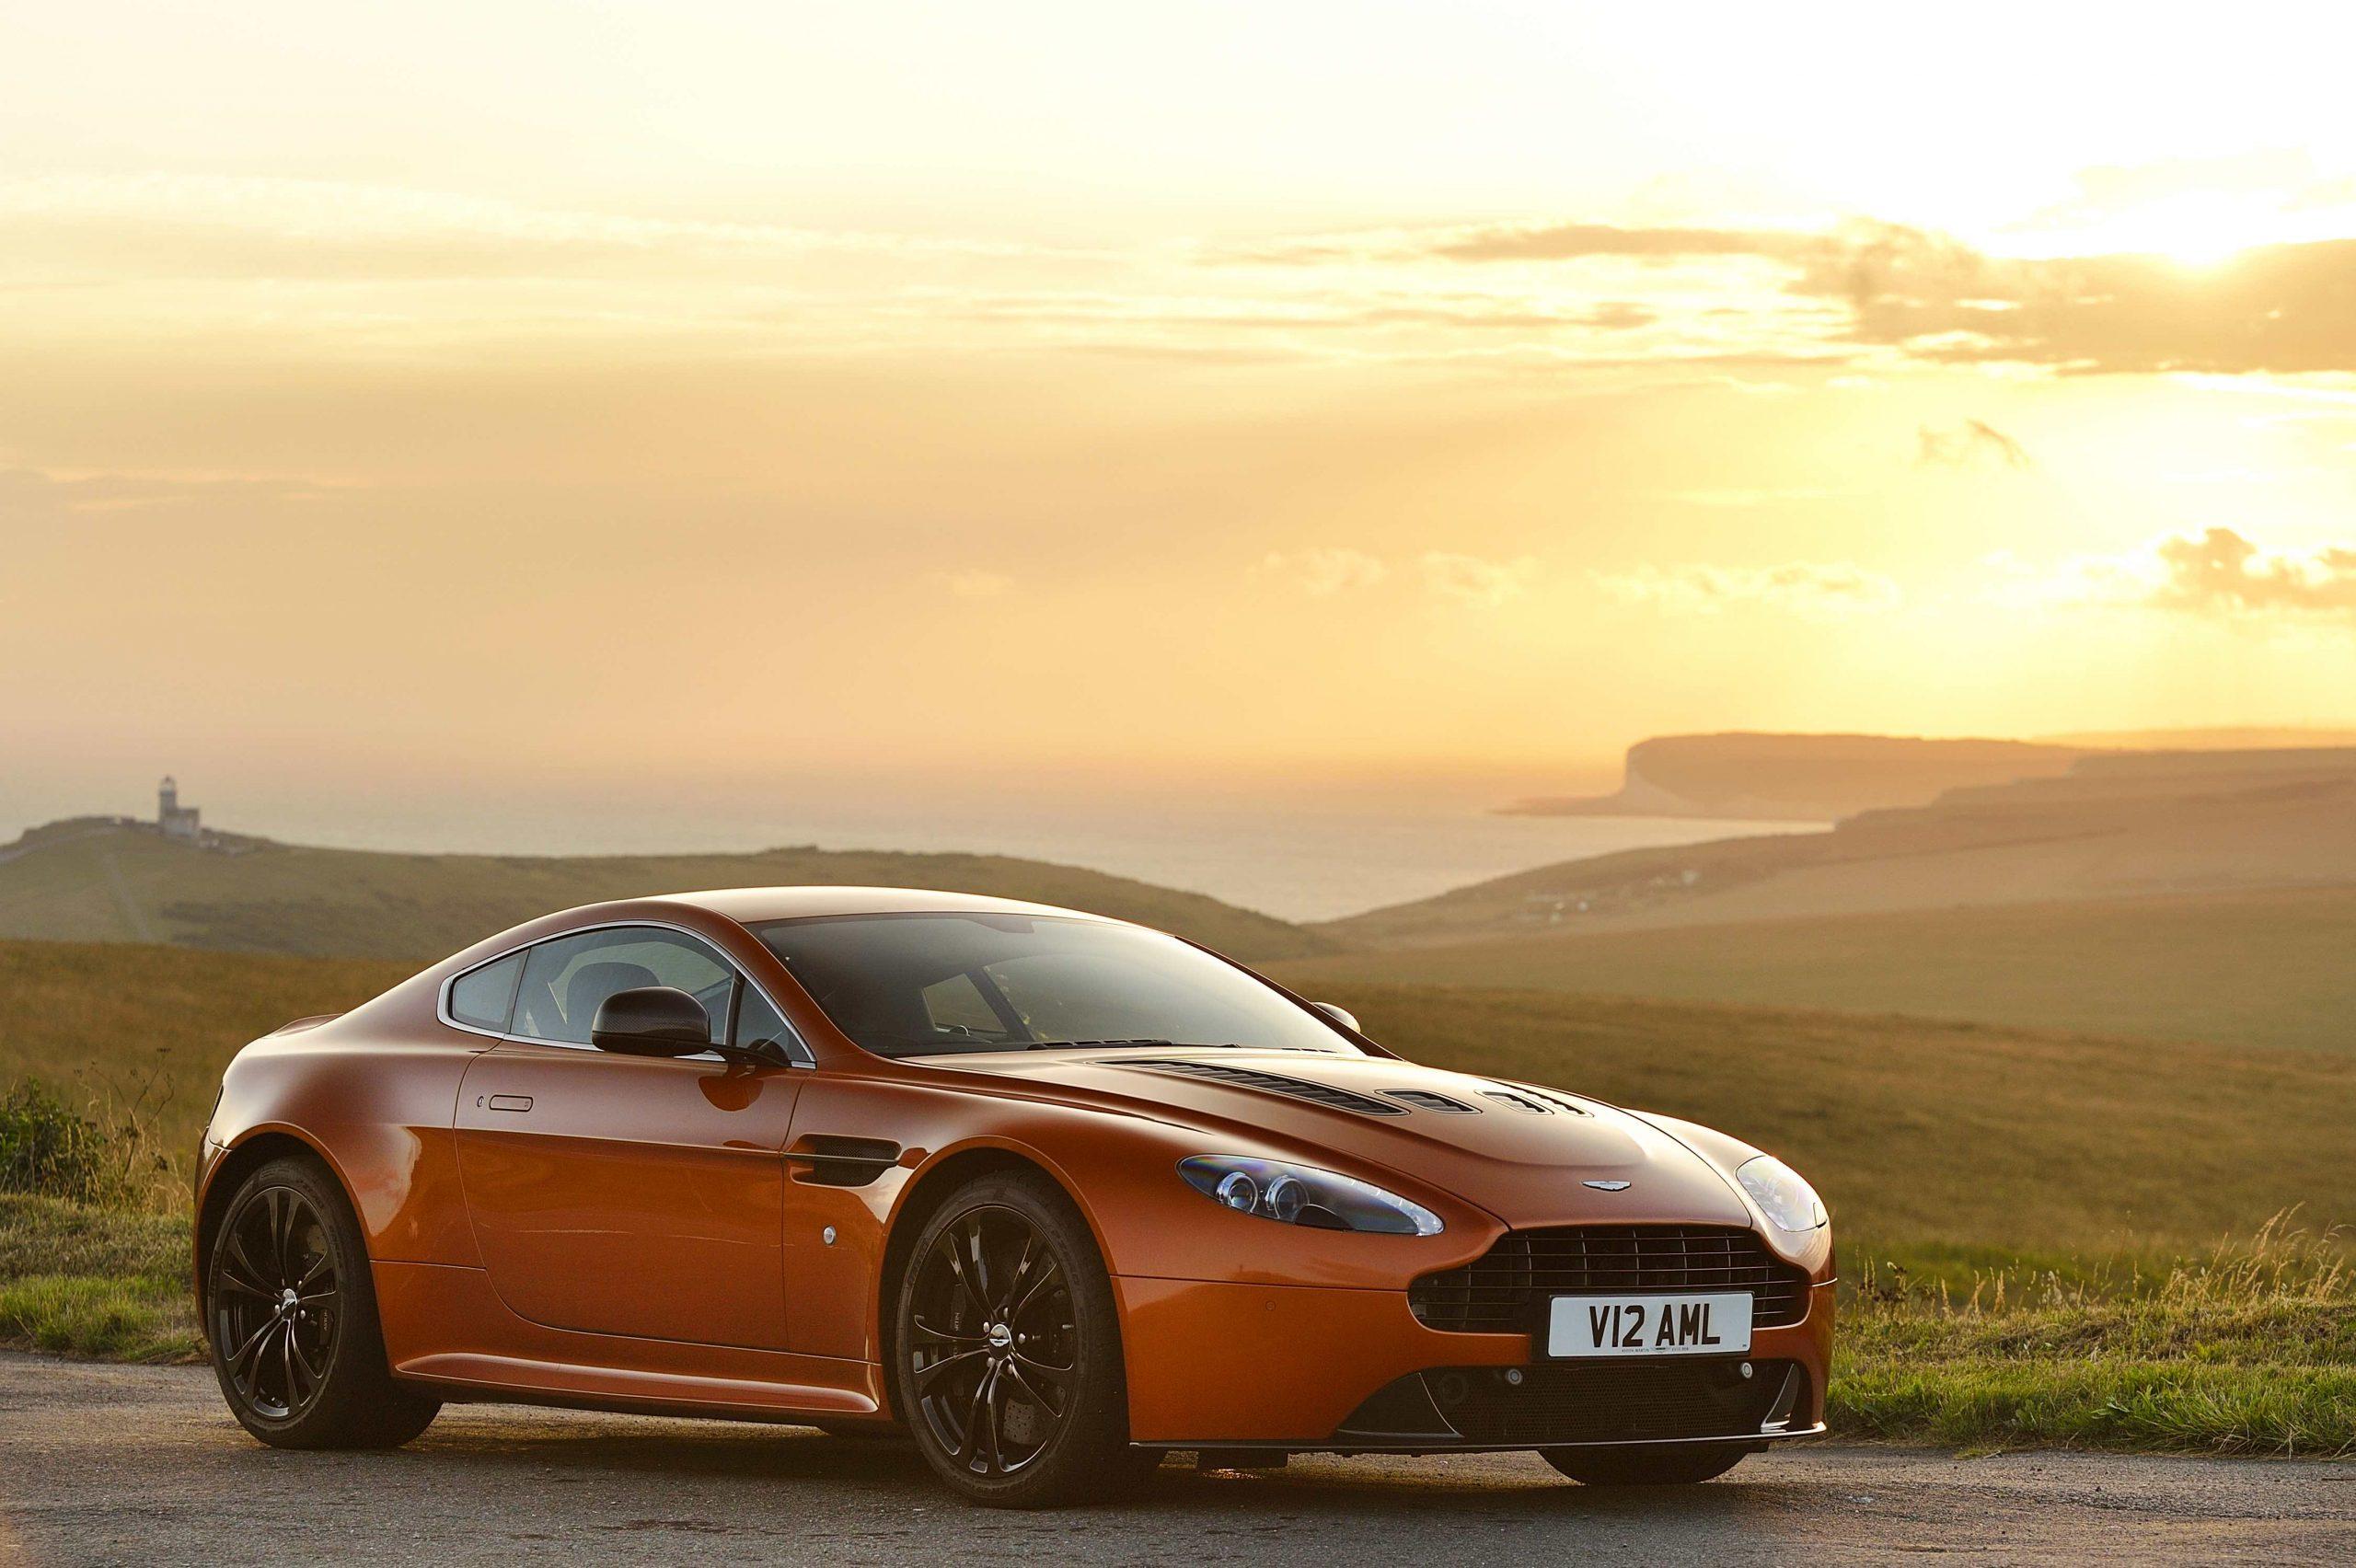 Future classic: Aston Martin V12 Vantage